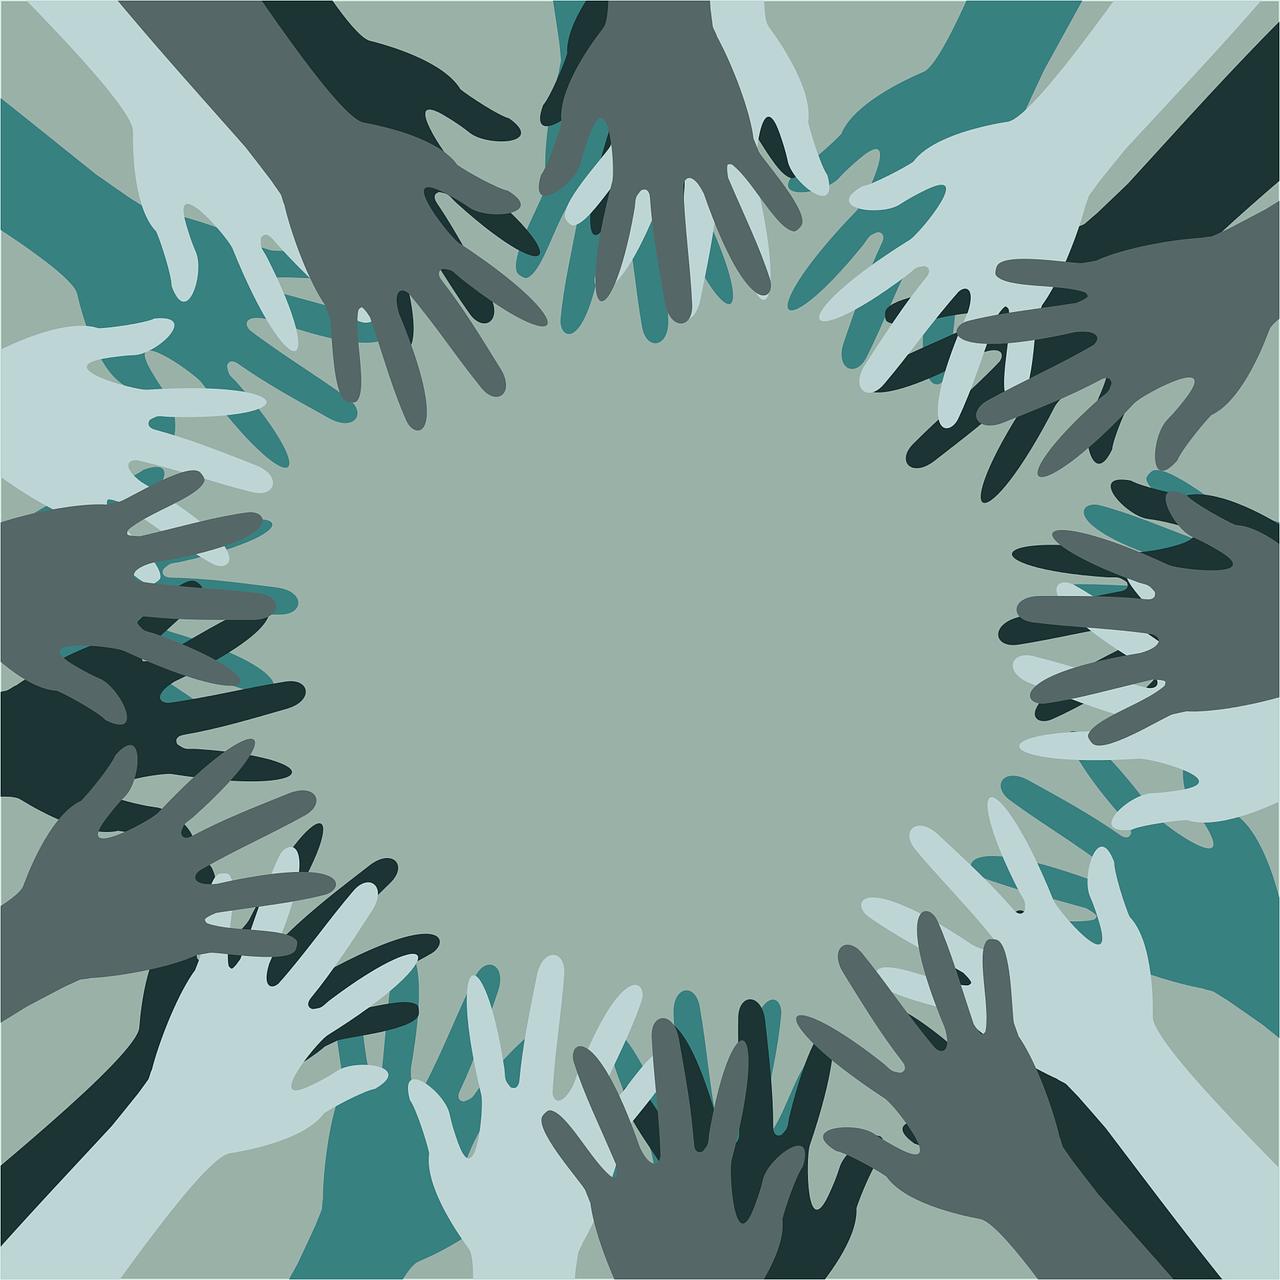 Employee Engagement: Should You Build a Sense of Belonging?